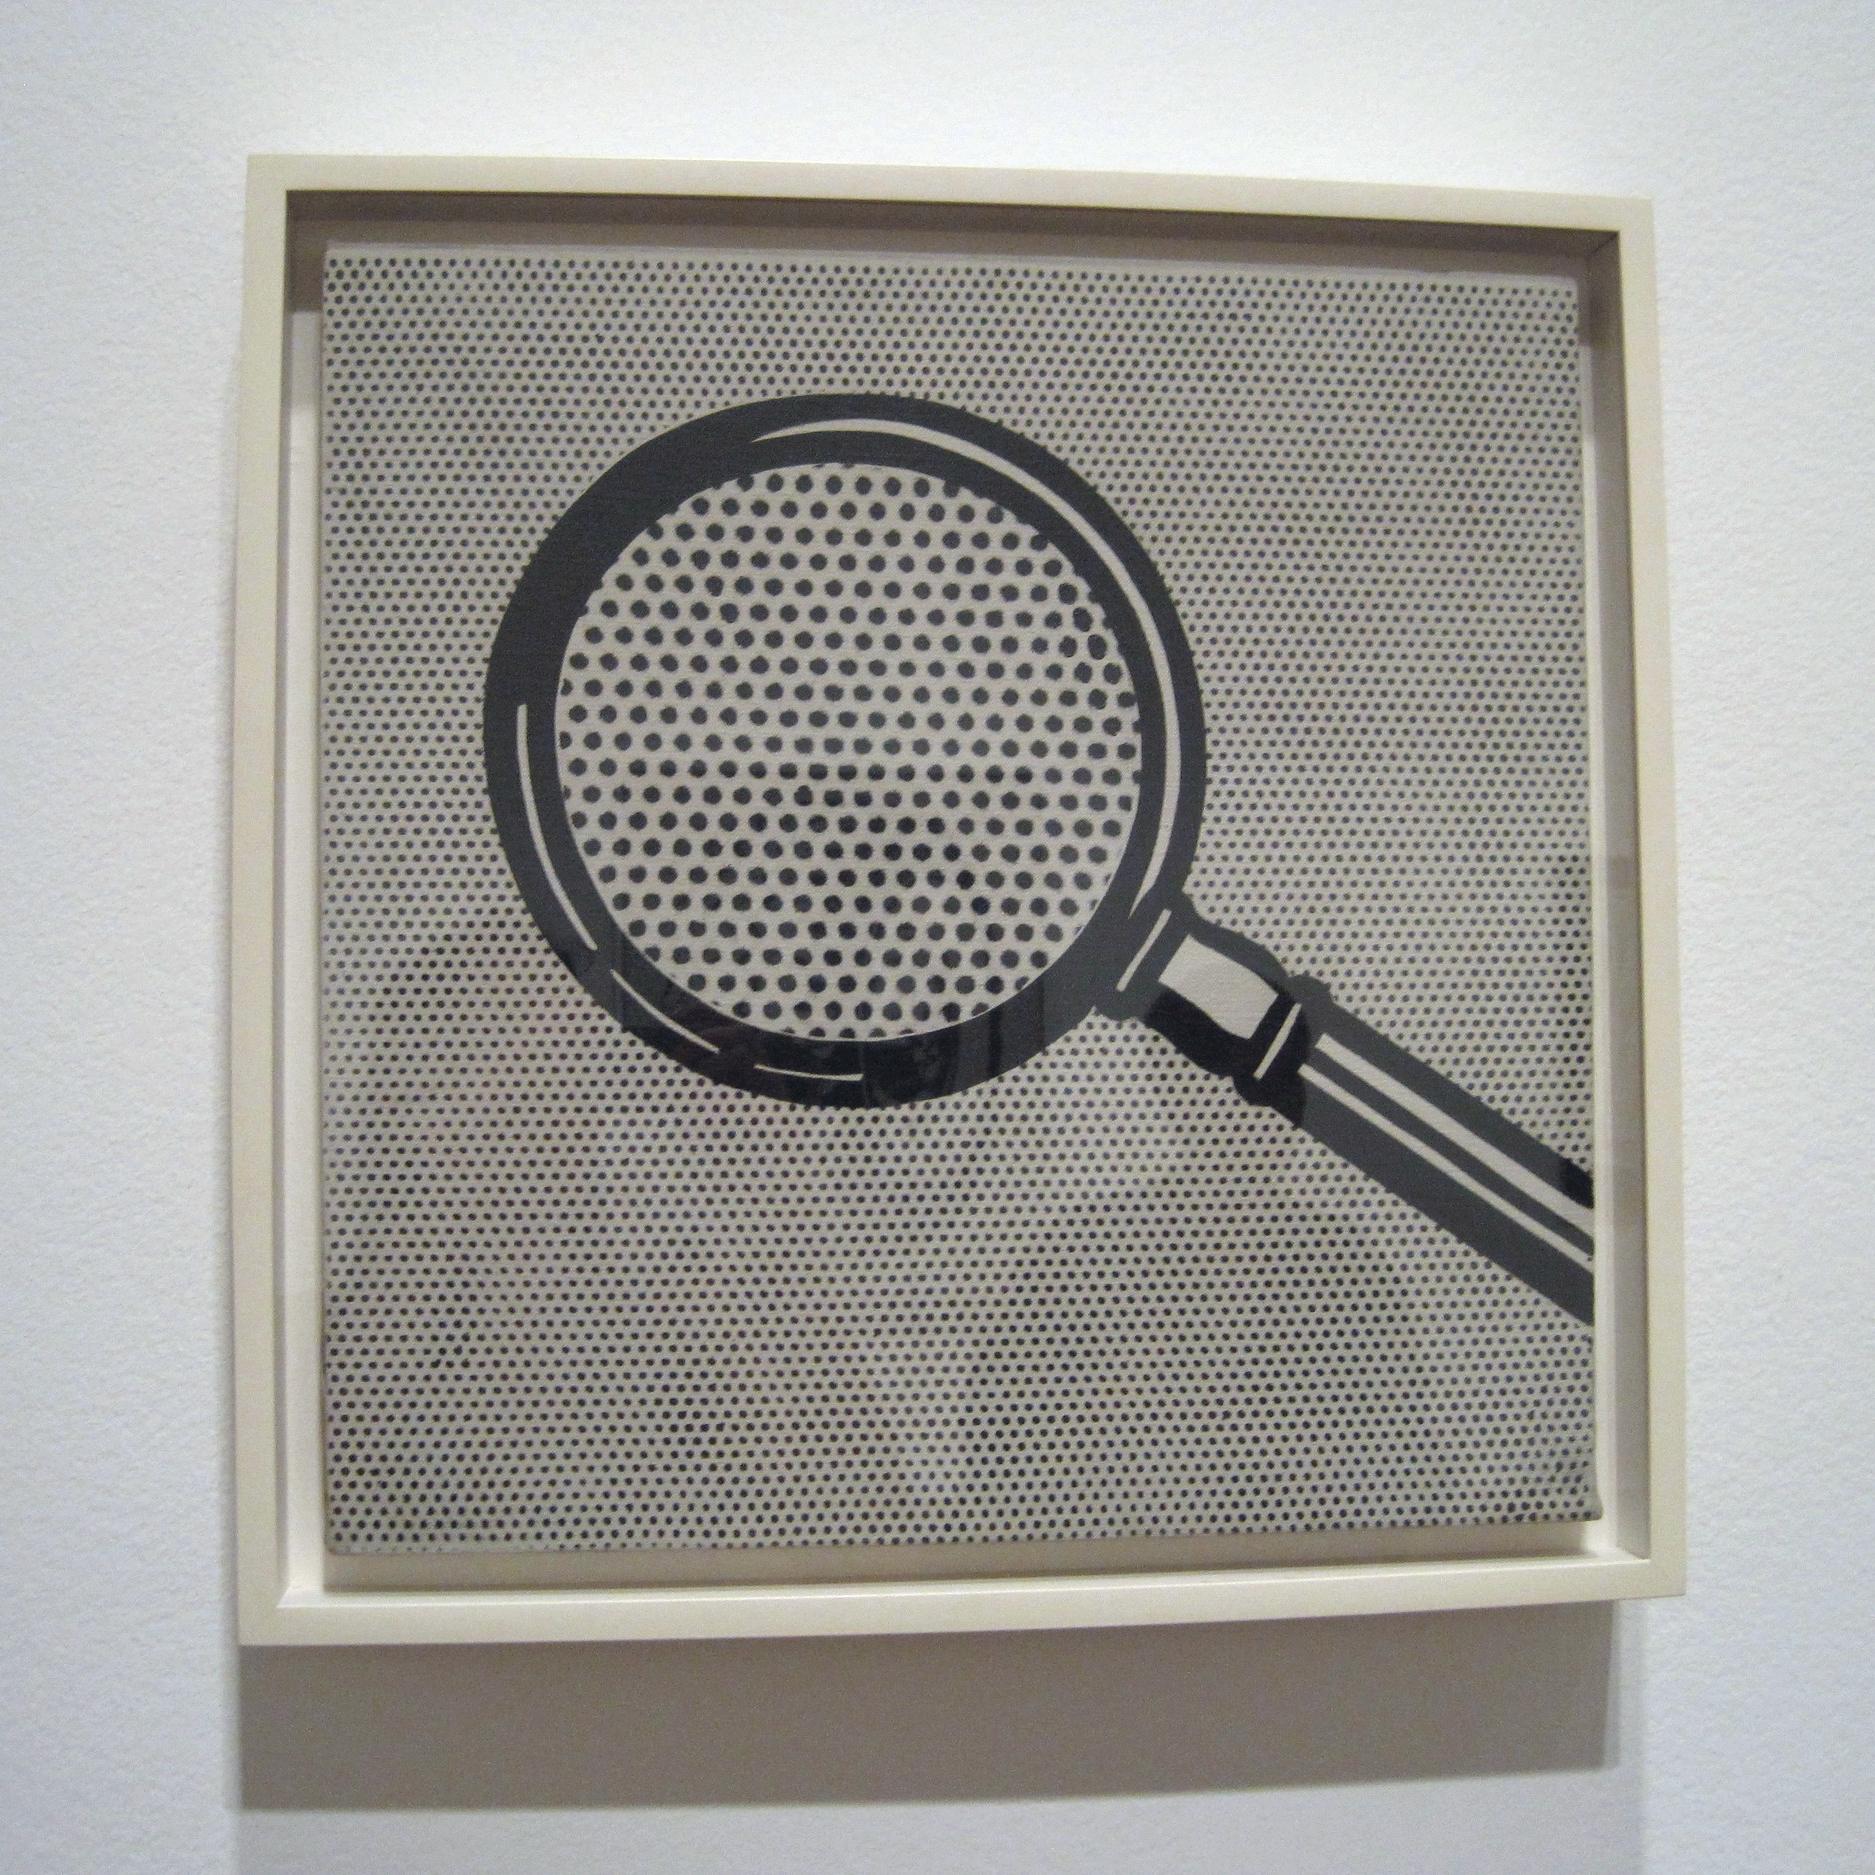 Roy Lichtenstein , Magnifying Glass,  1963, Exhibited at The Art Institute of Chicago, Summer 2012